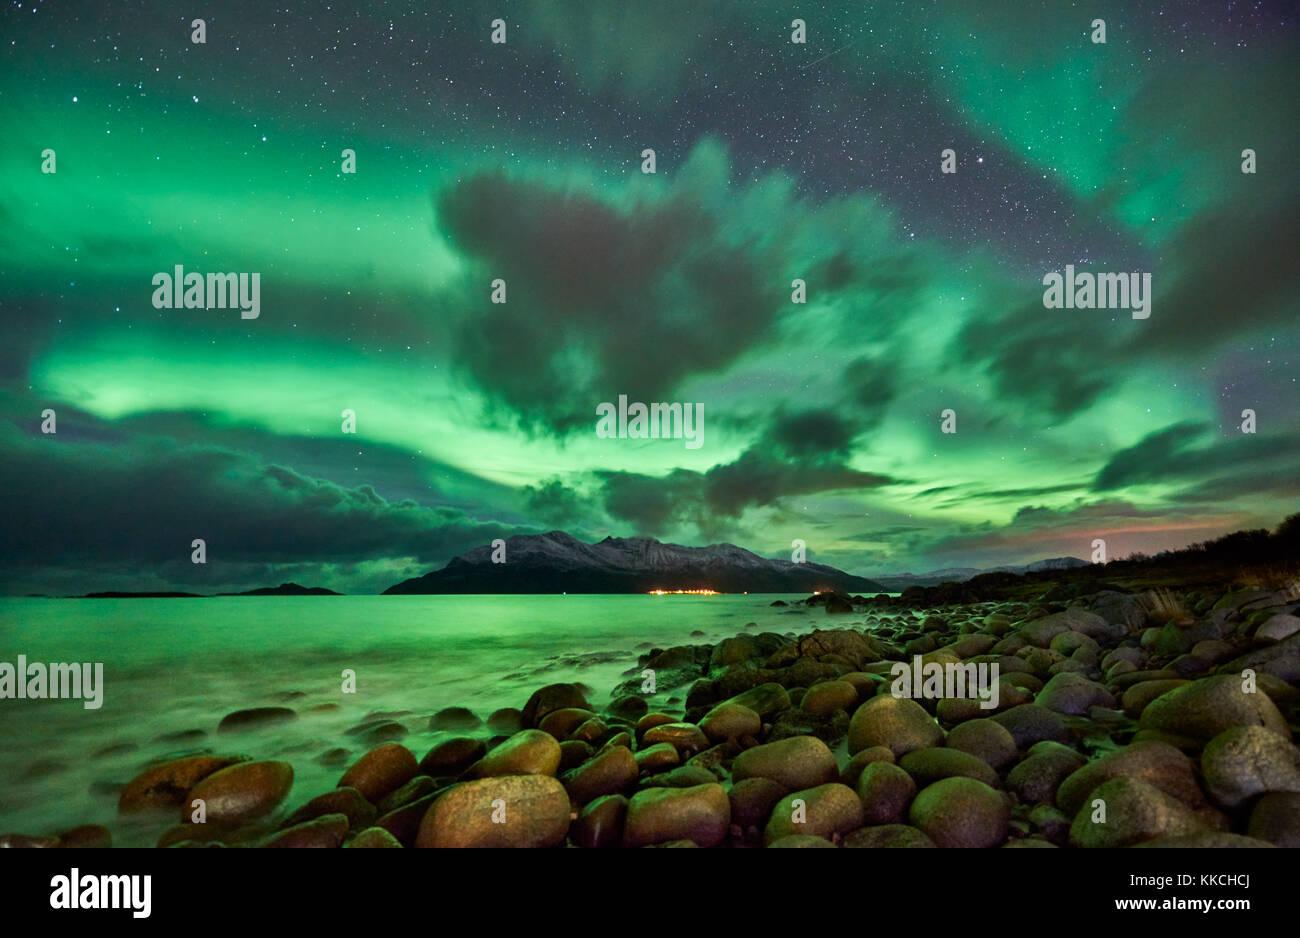 La Aurora Boreal o luces del norte sobre paisaje invernal en el fiordo de Kaldfjord, Tromvik, Tromso, Troms, Noruega, Europa Foto de stock